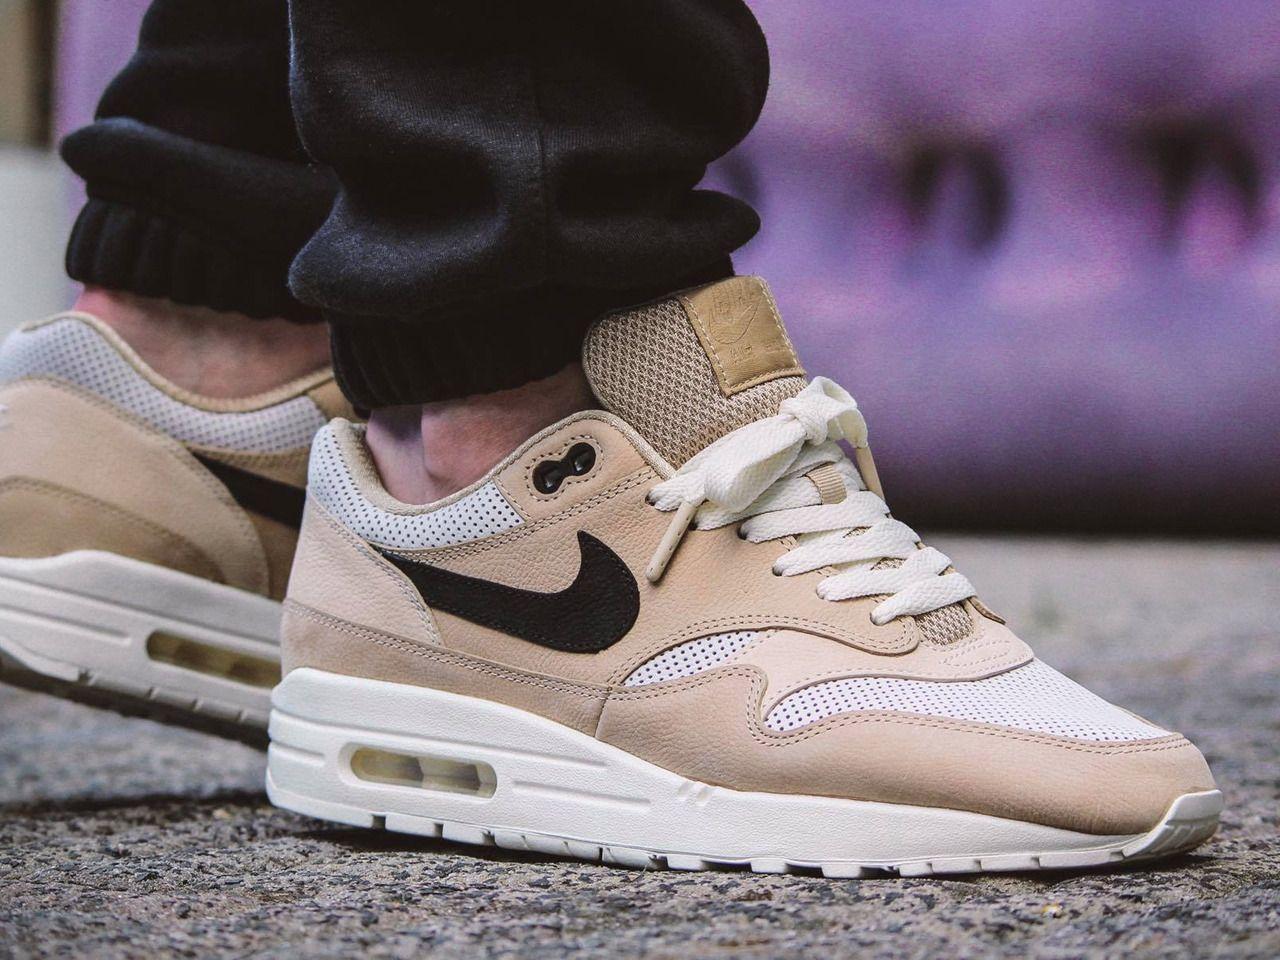 irregular solapa jefe  Nike wmns Air Max 1 Pinnacle - Mushroom/Black/Light Bone - 2017 (by  maikelboeve) Buy it: Overkill / End Clo… | Sneakers men fashion, Sneakers  fashion, Sneakers men